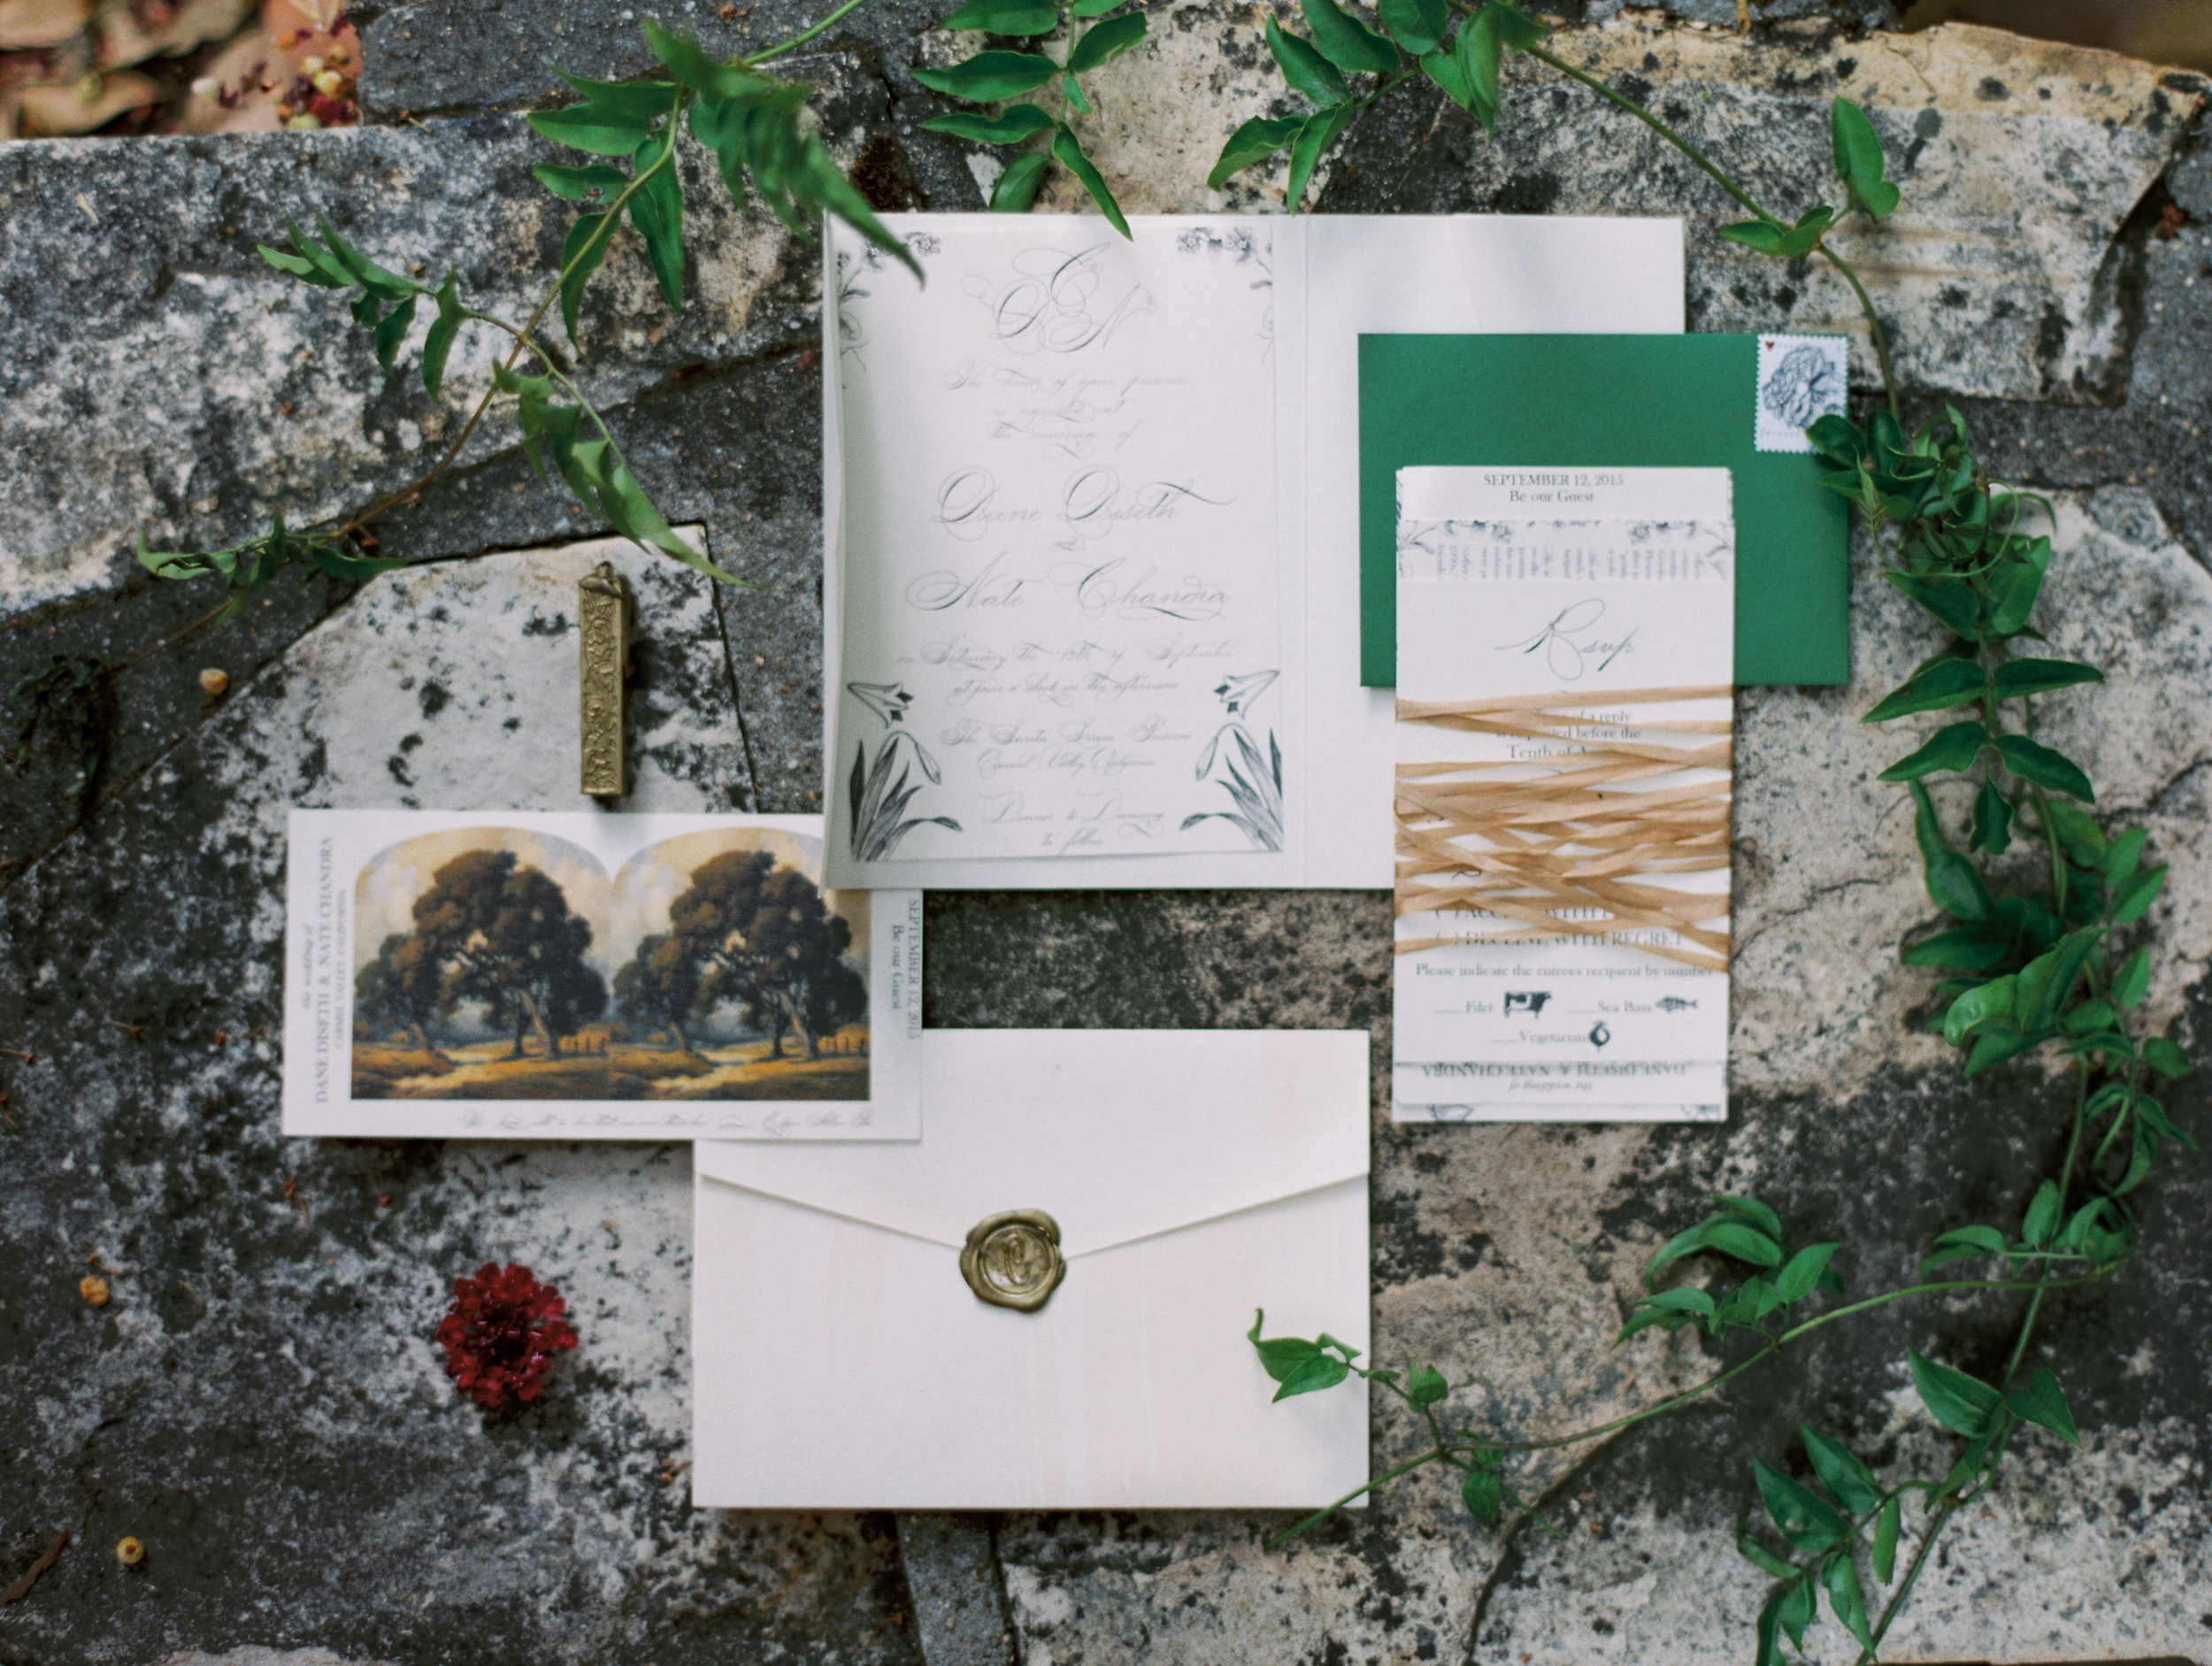 JENNIFER-SKOG-dane-nate-santa-lucia-preserve-wedding-0465.jpg